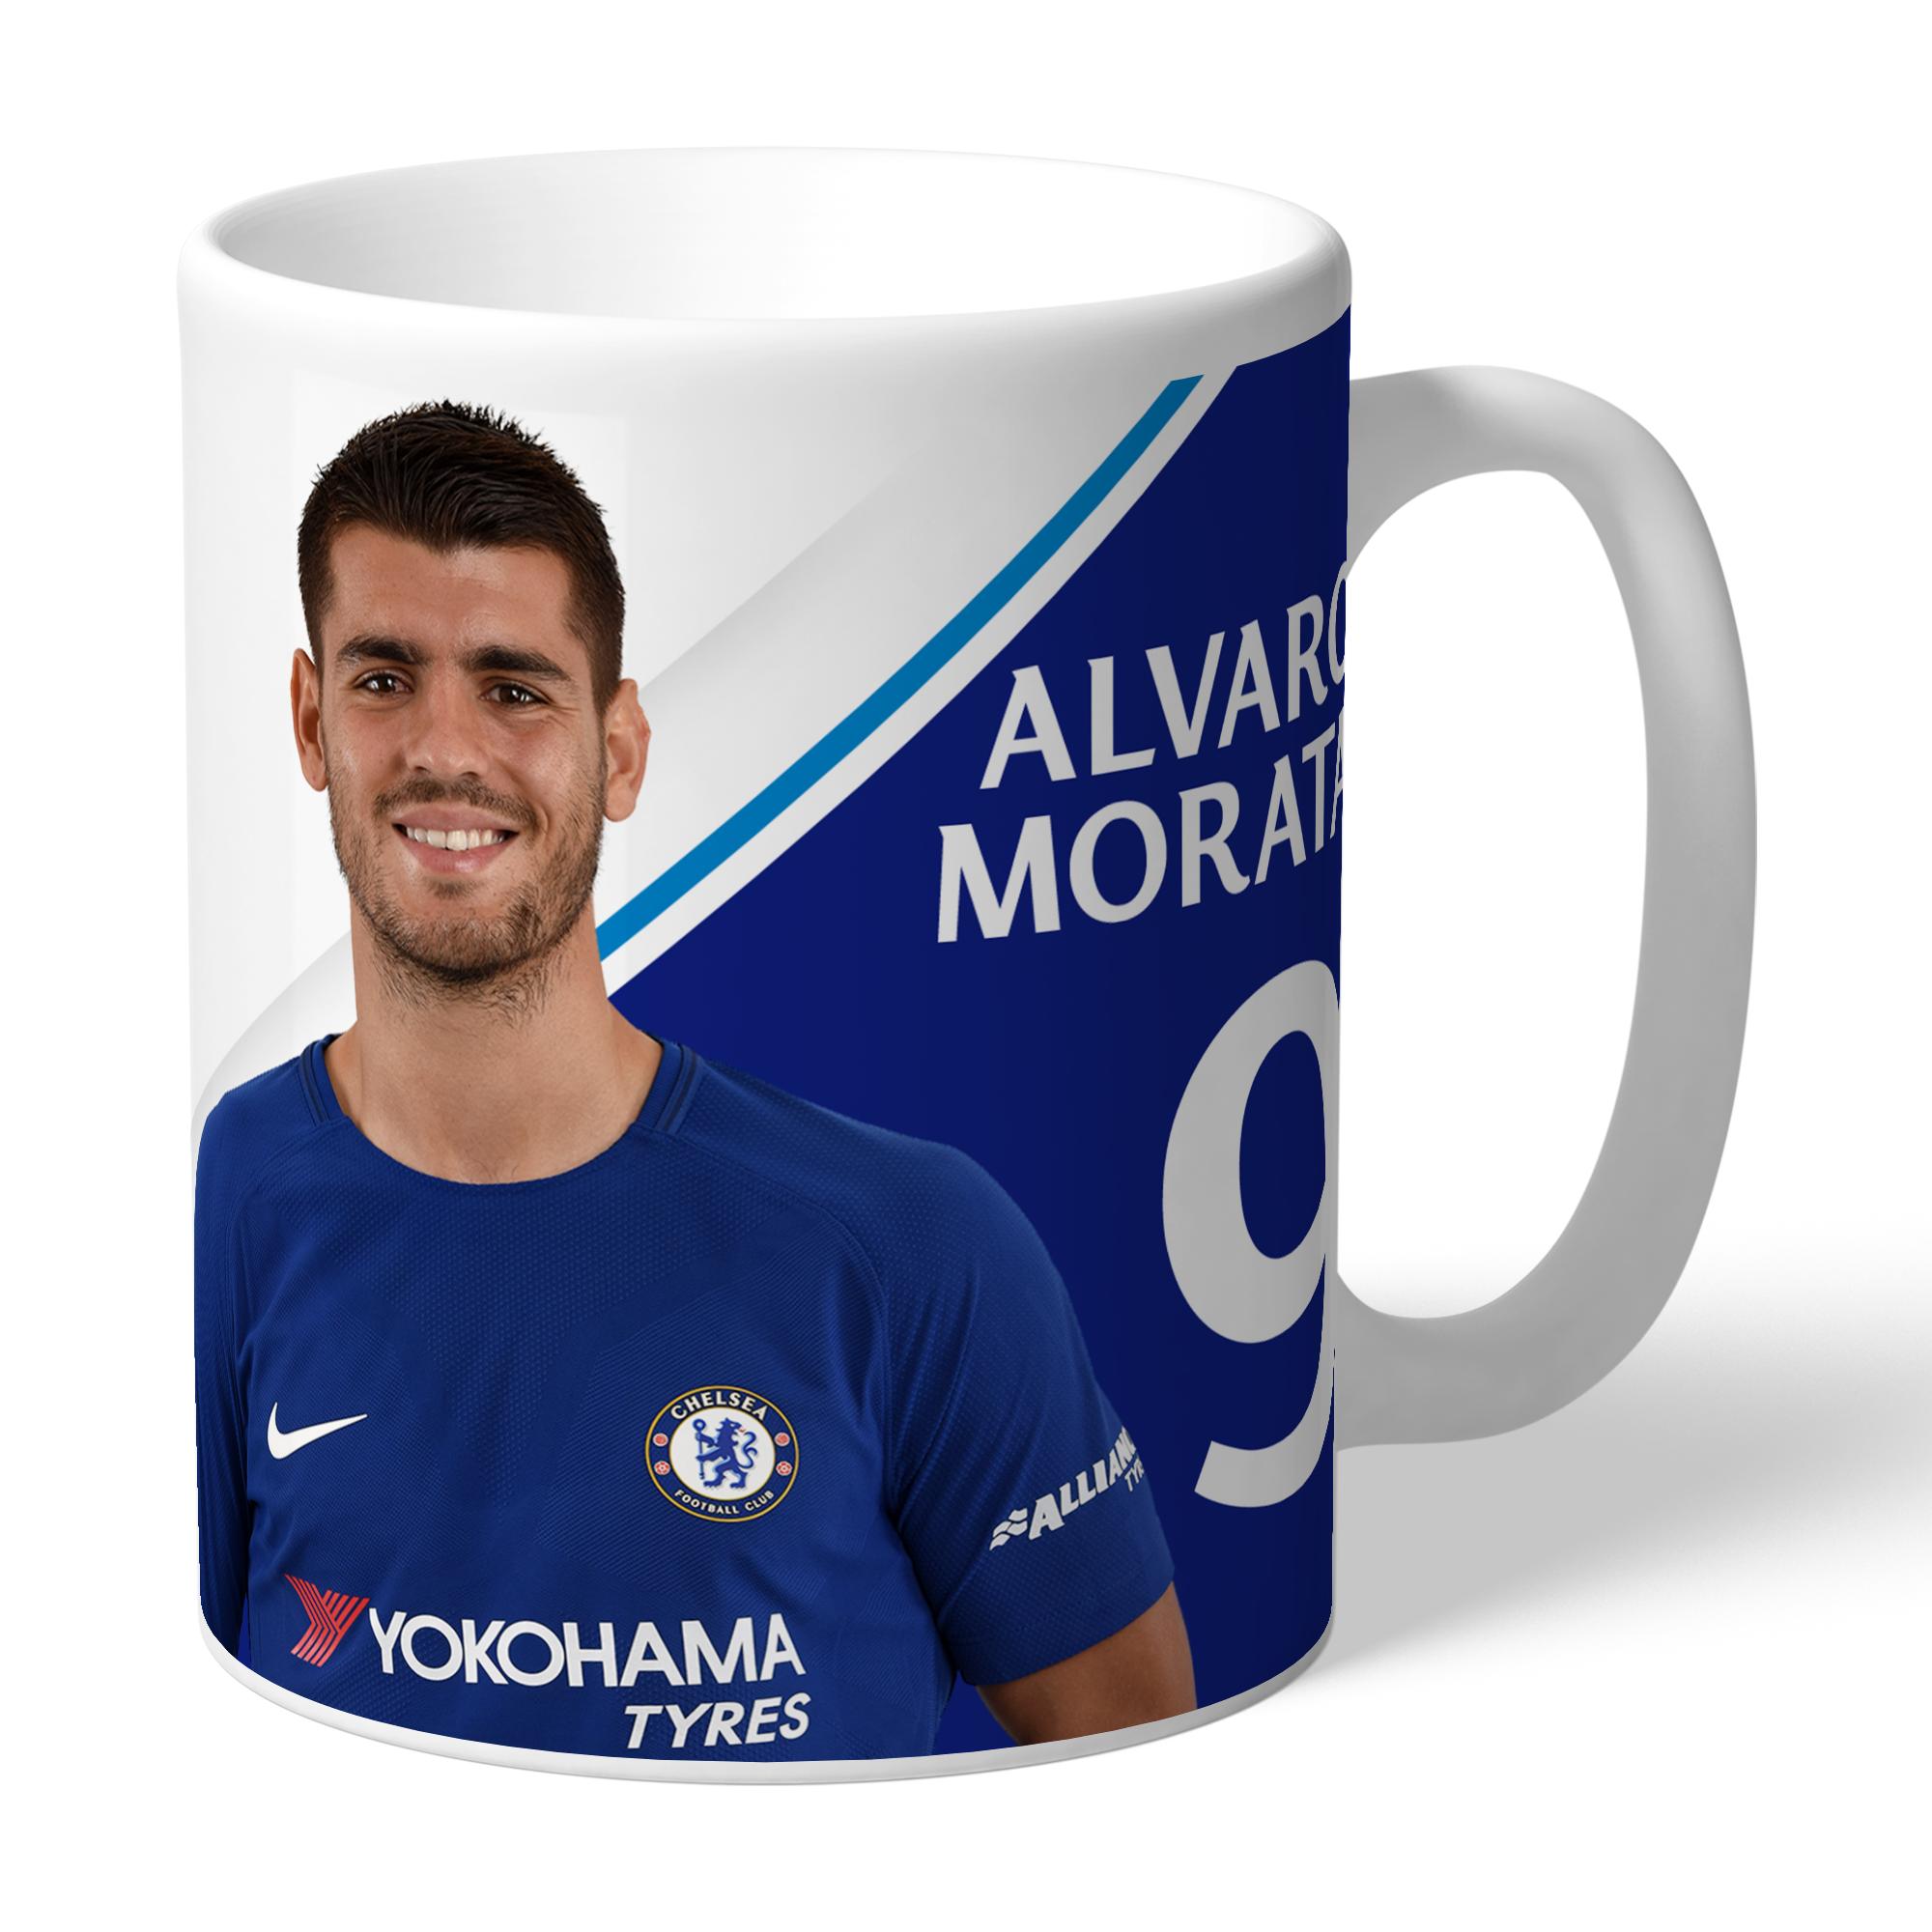 Chelsea FC Morata Autograph Mug